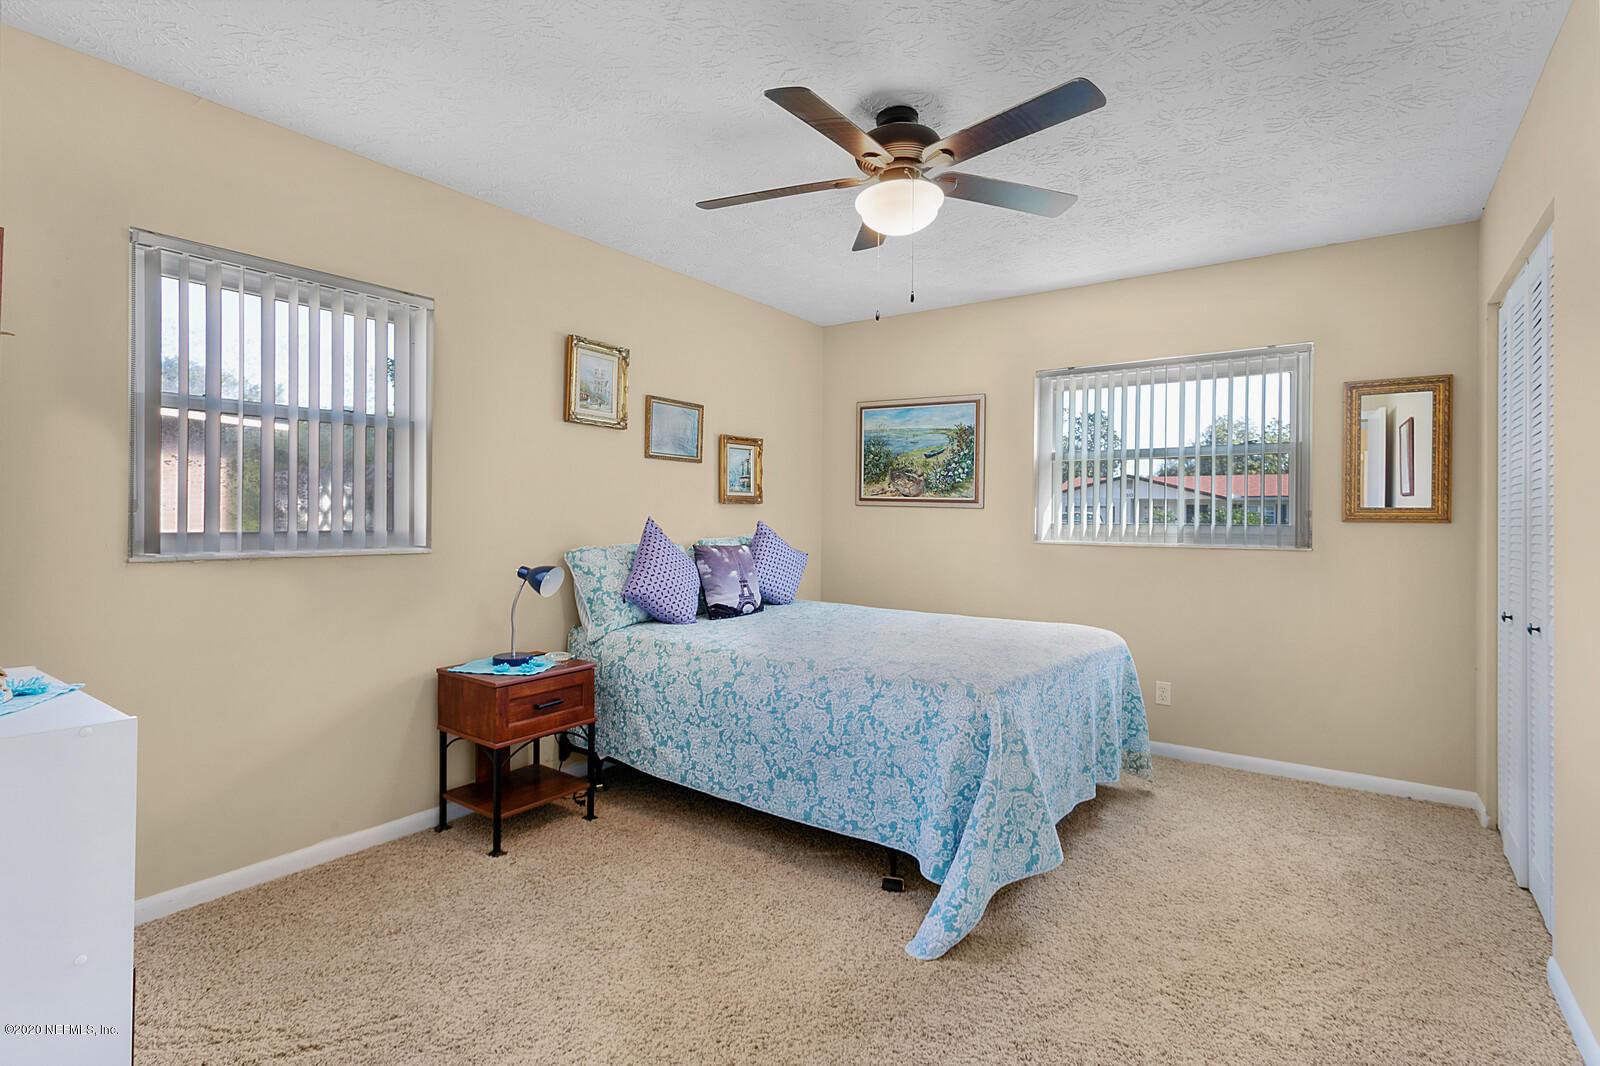 7806 LISA, JACKSONVILLE, FLORIDA 32217, 3 Bedrooms Bedrooms, ,2 BathroomsBathrooms,Residential,For sale,LISA,1082765